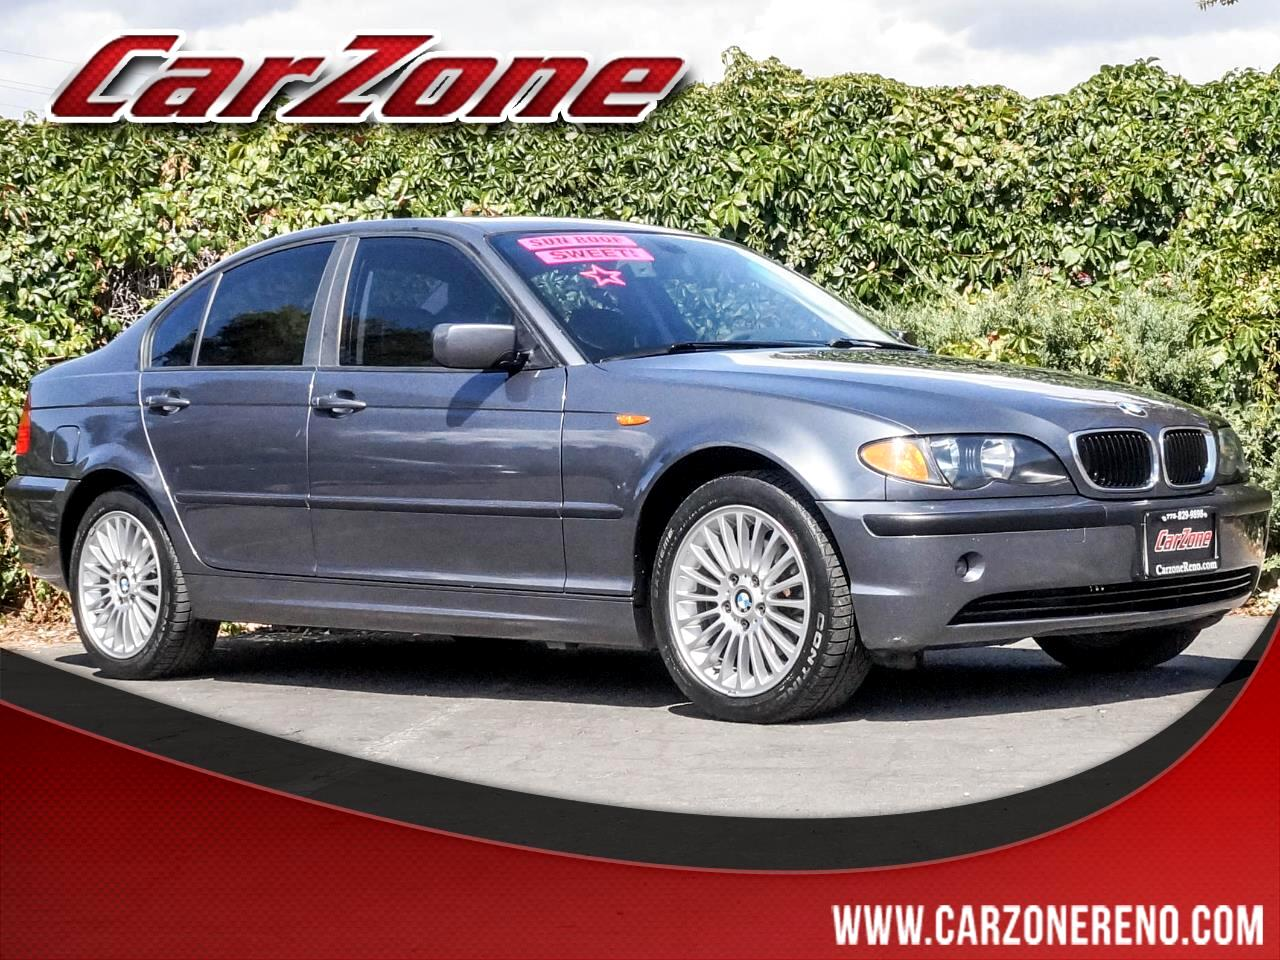 2003 BMW 3 Series 325xi 4dr Sdn AWD